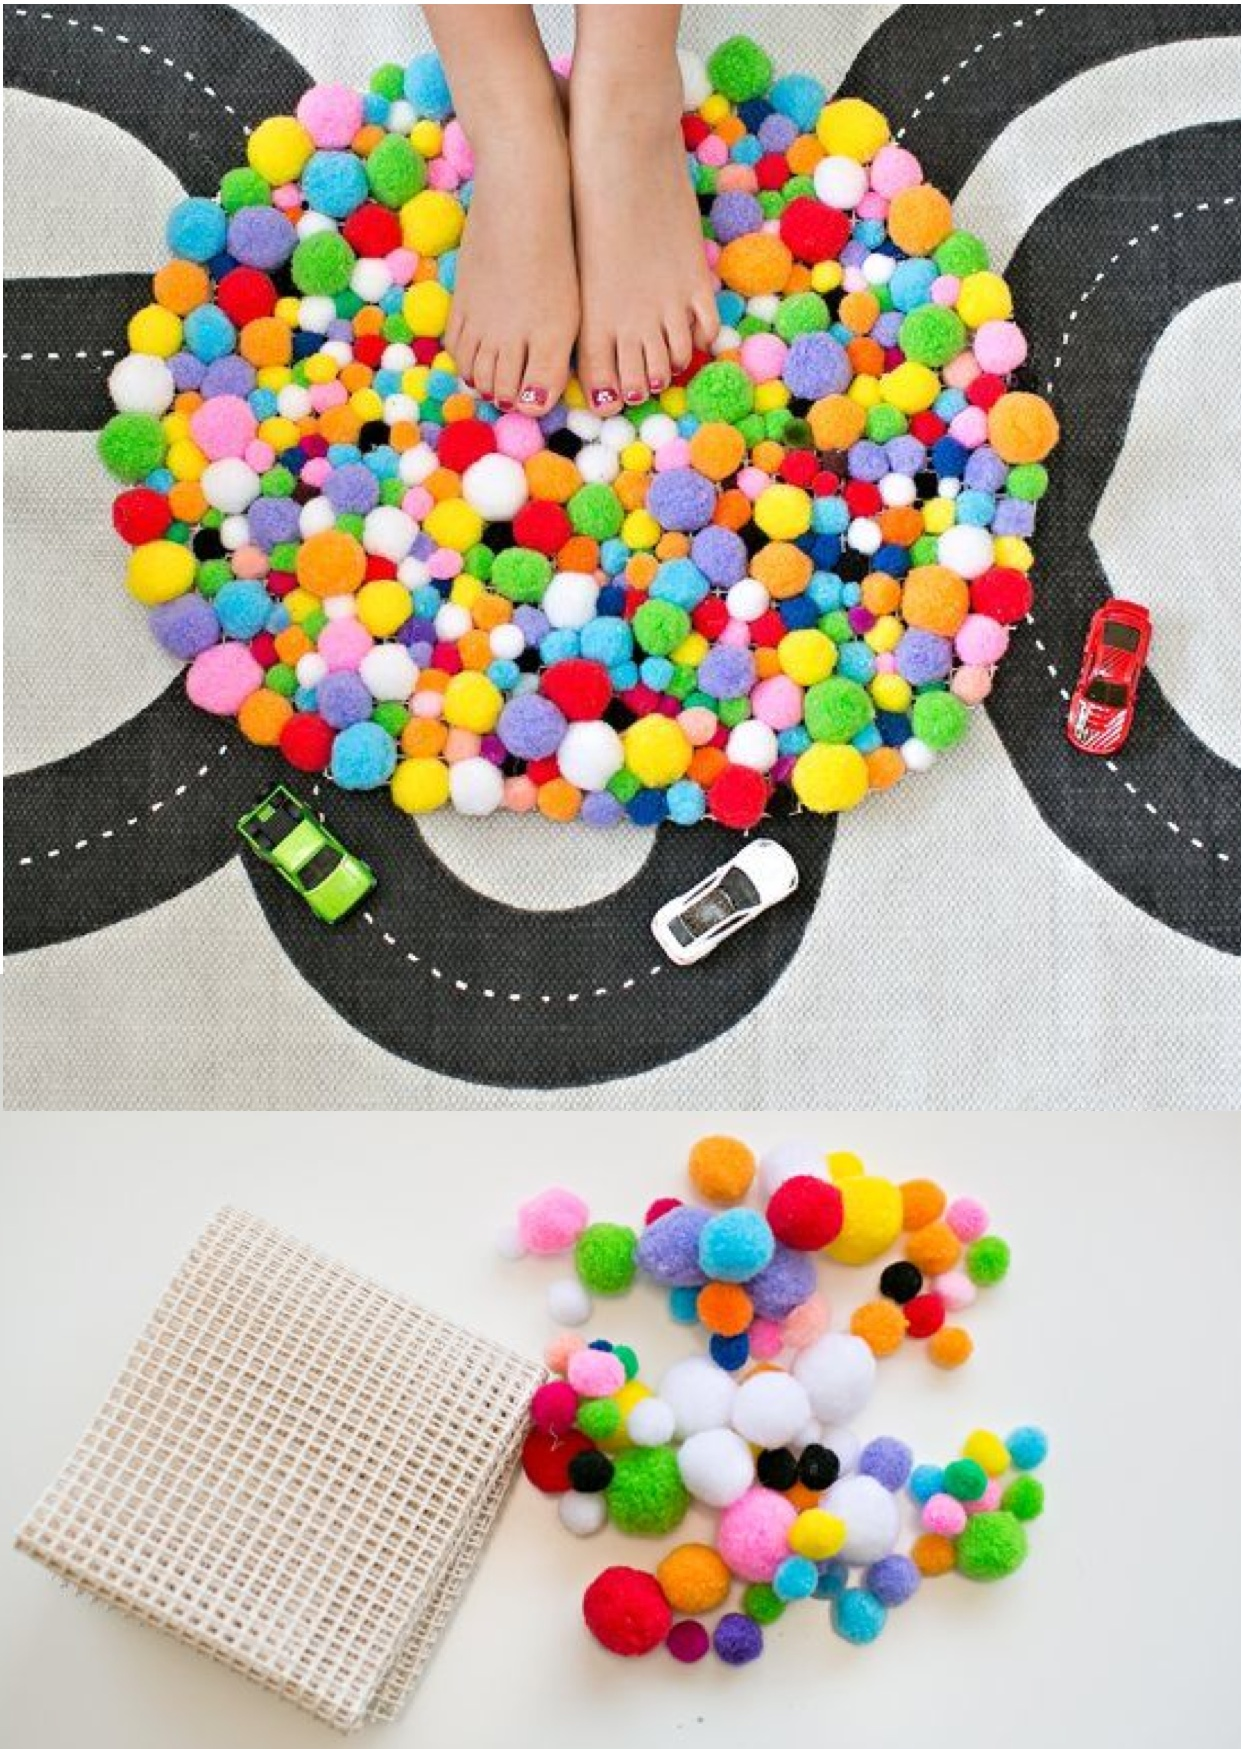 10 Diy Ideas For Kid S Room Mommo Design